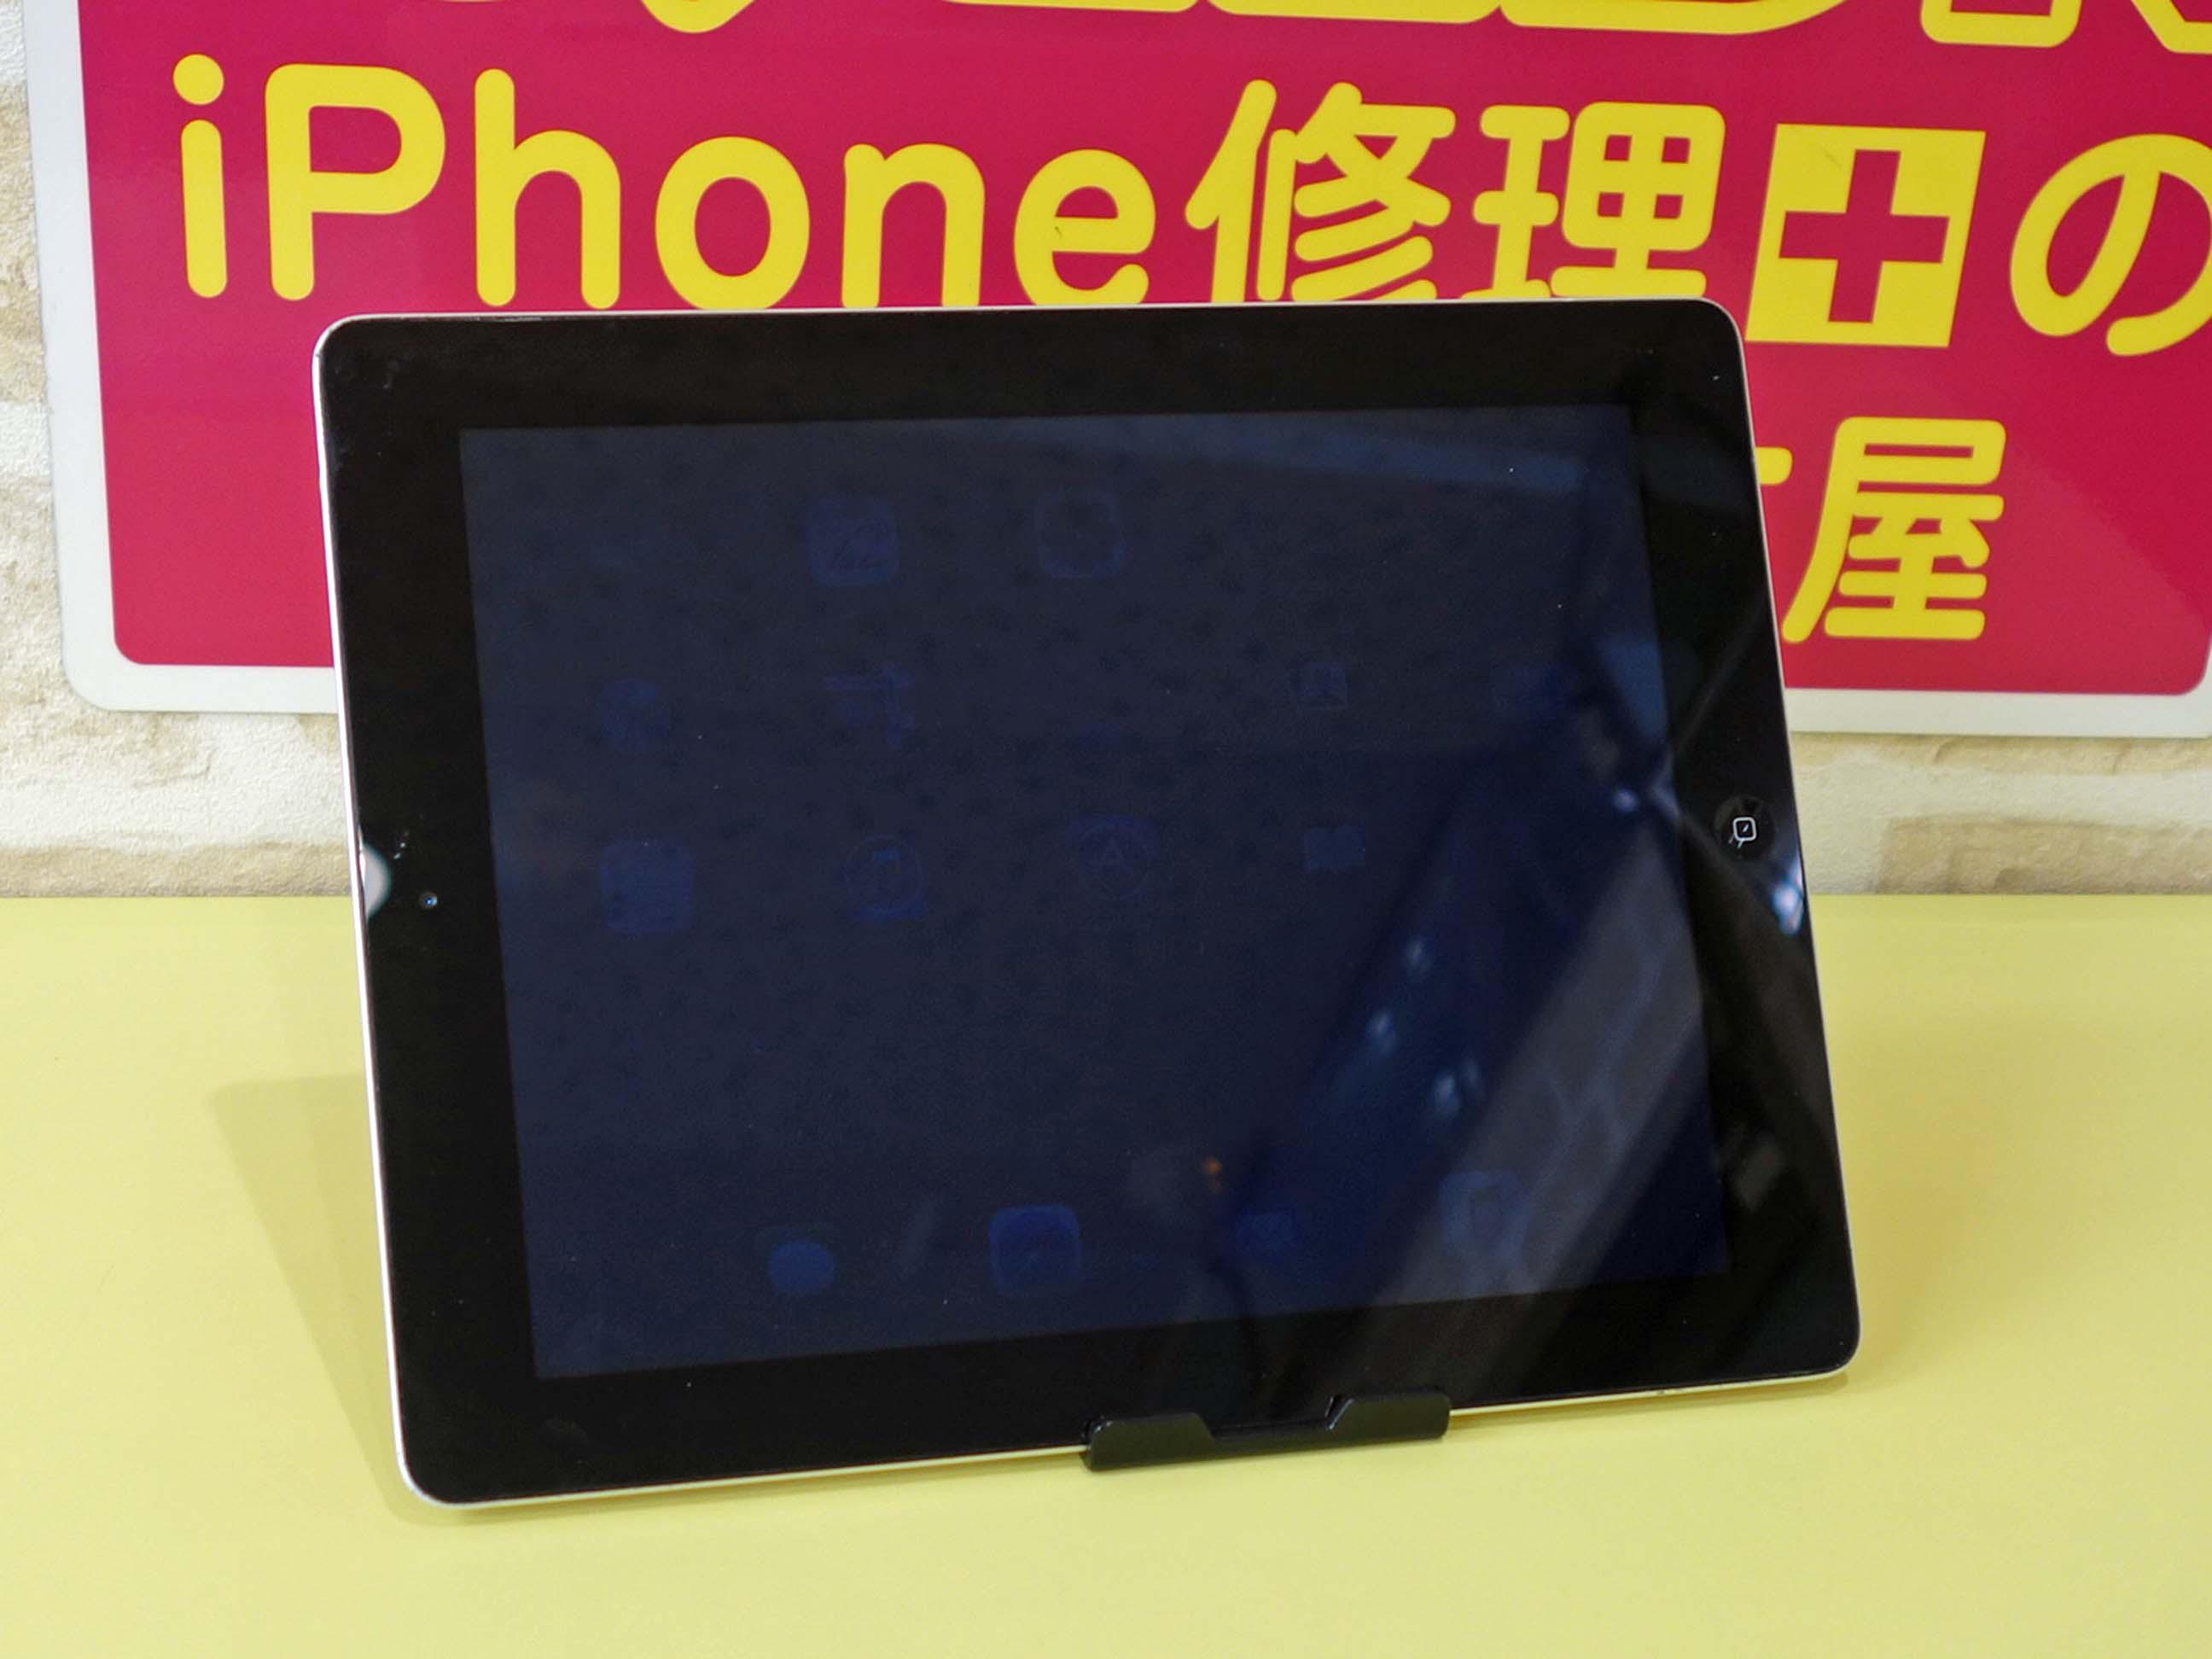 iPad2の液晶交換修理で名古屋市内からご来店!アイパッド修理もクイック名古屋